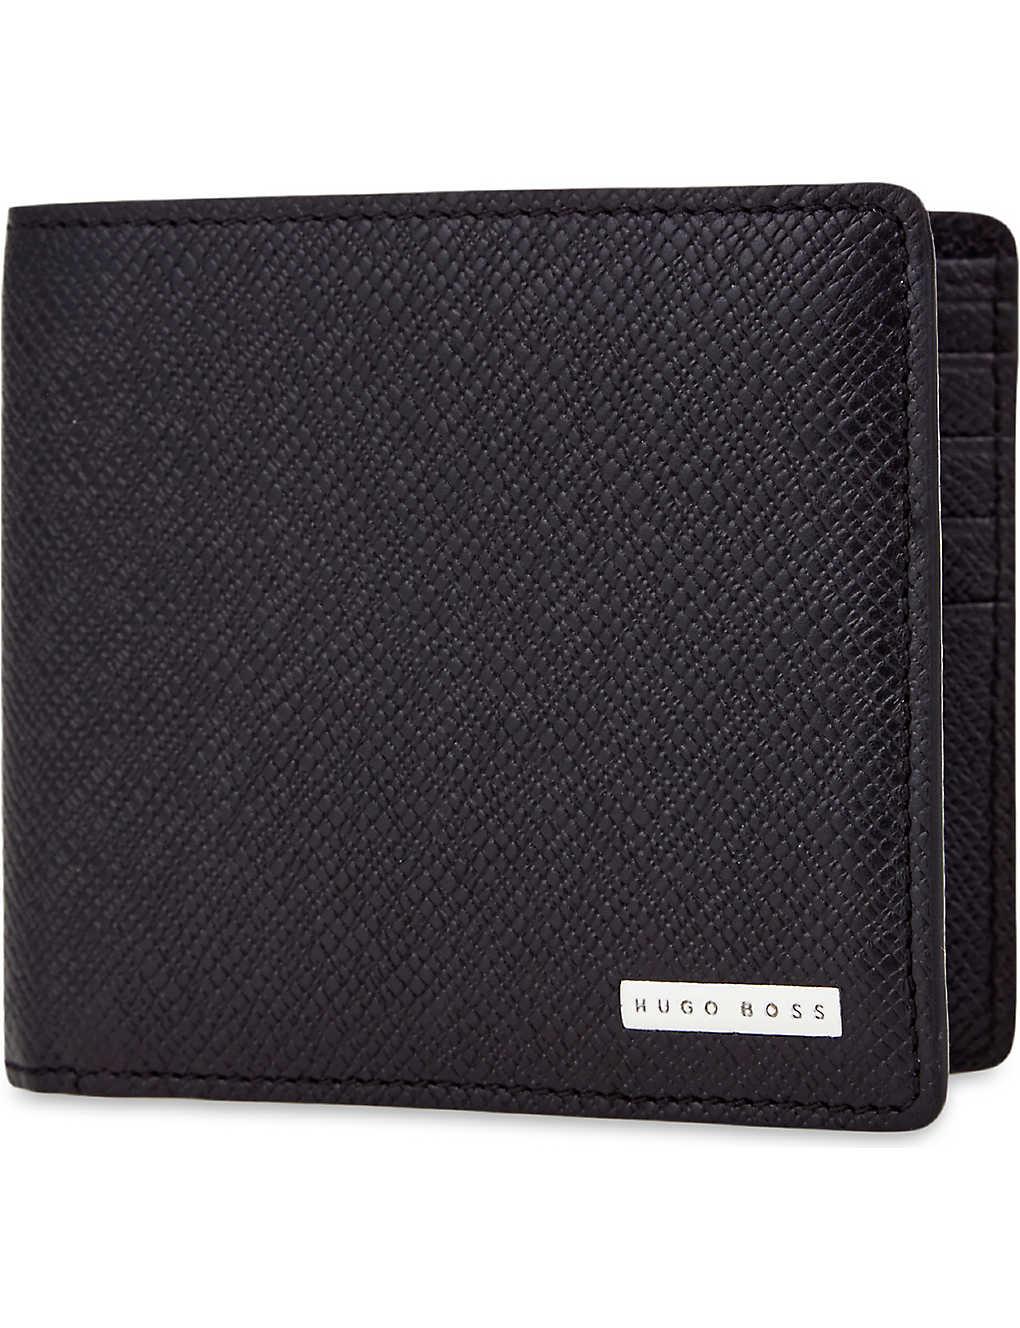 8163afba23 BOSS - Signature grained leather billfold wallet | Selfridges.com